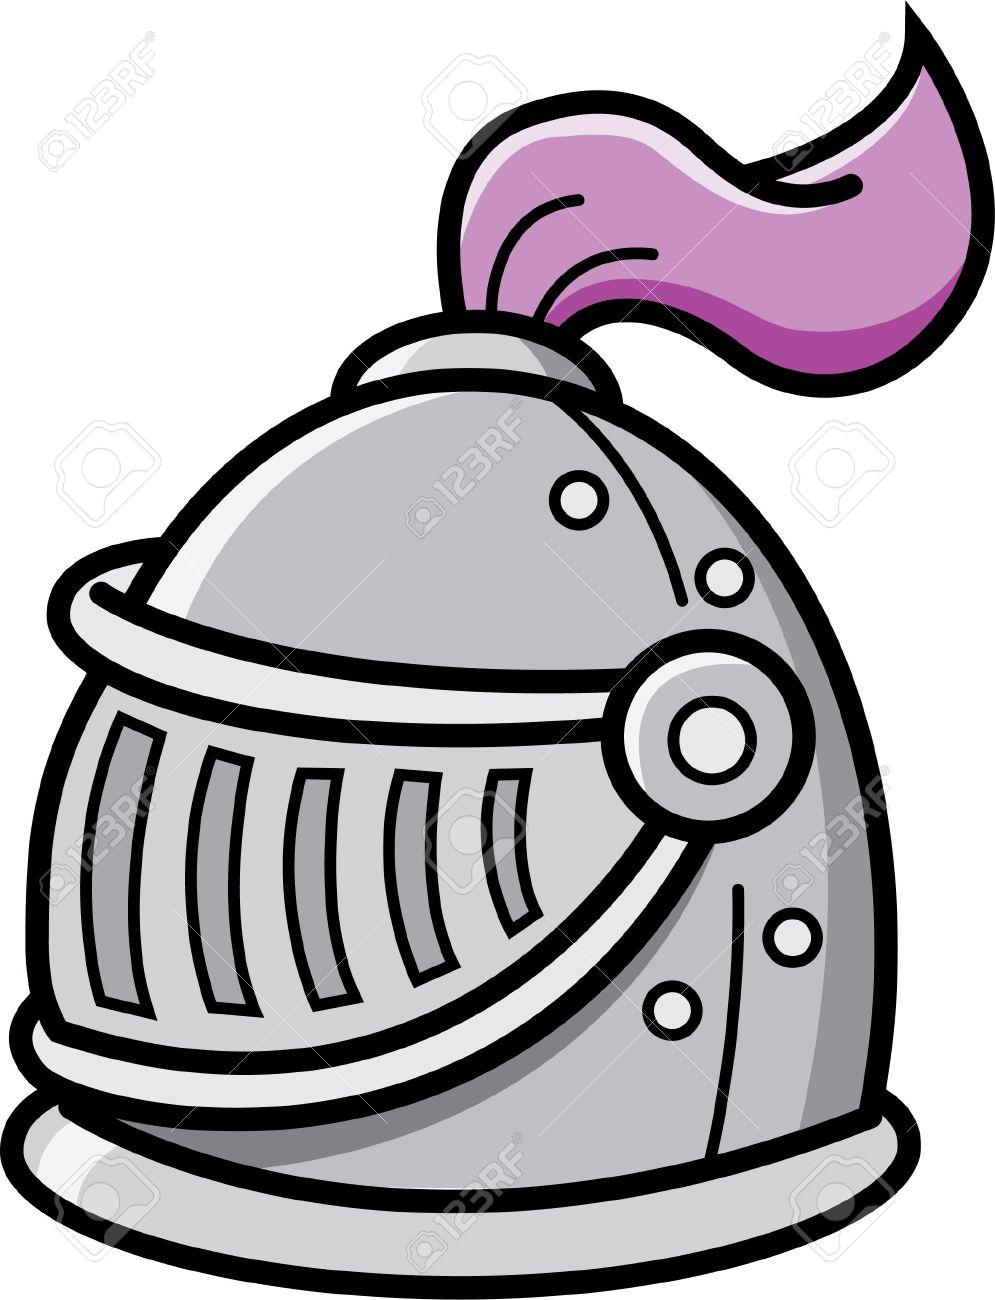 cartoon illustration of a knight s helmet royalty free cliparts